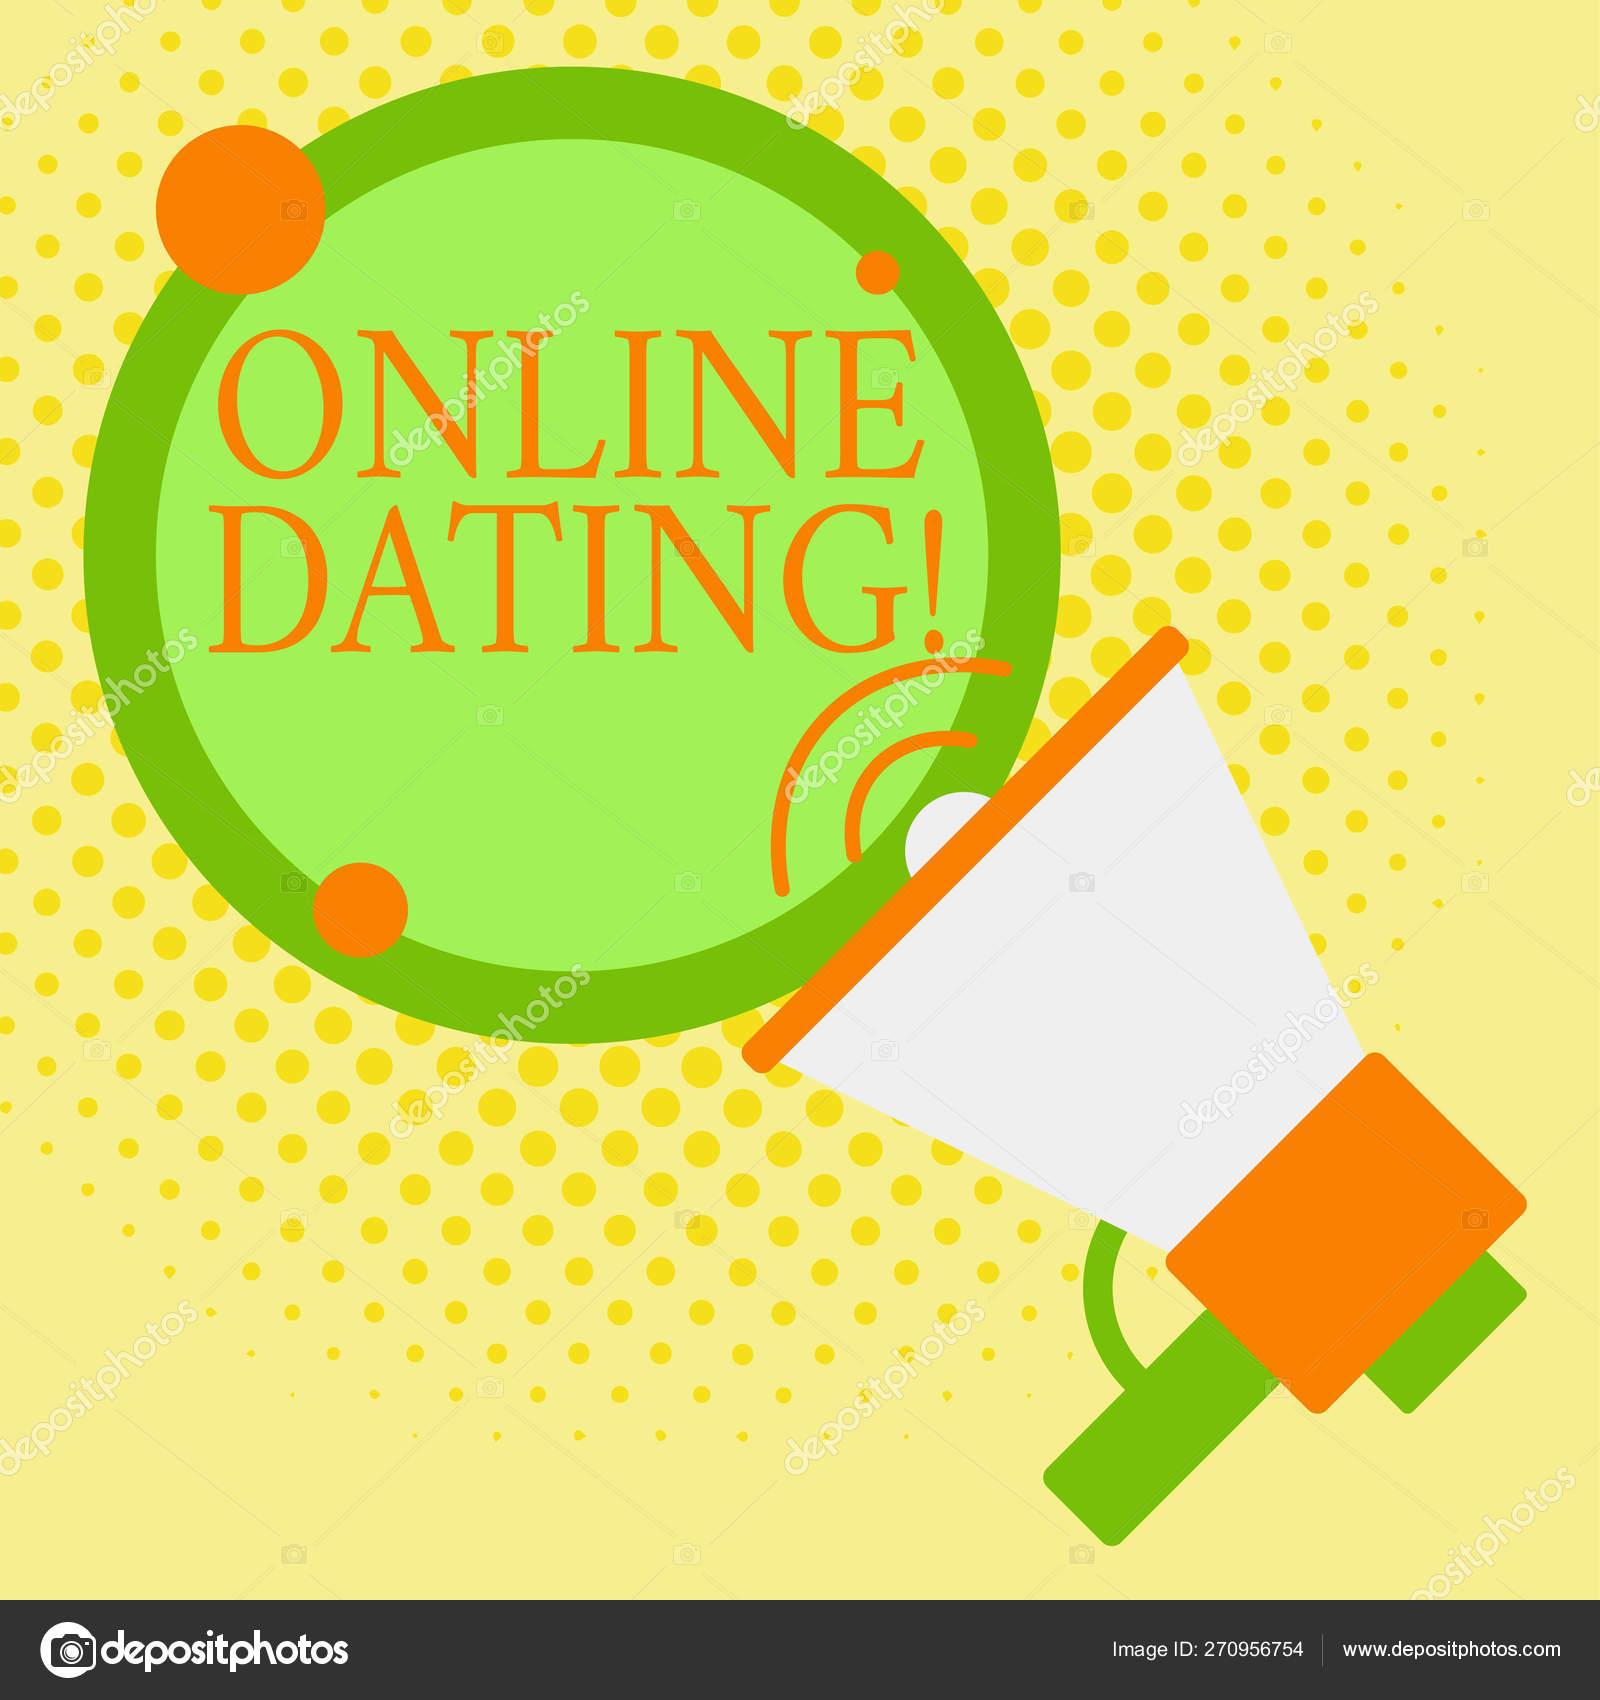 Loma linda broadcasting network latino dating